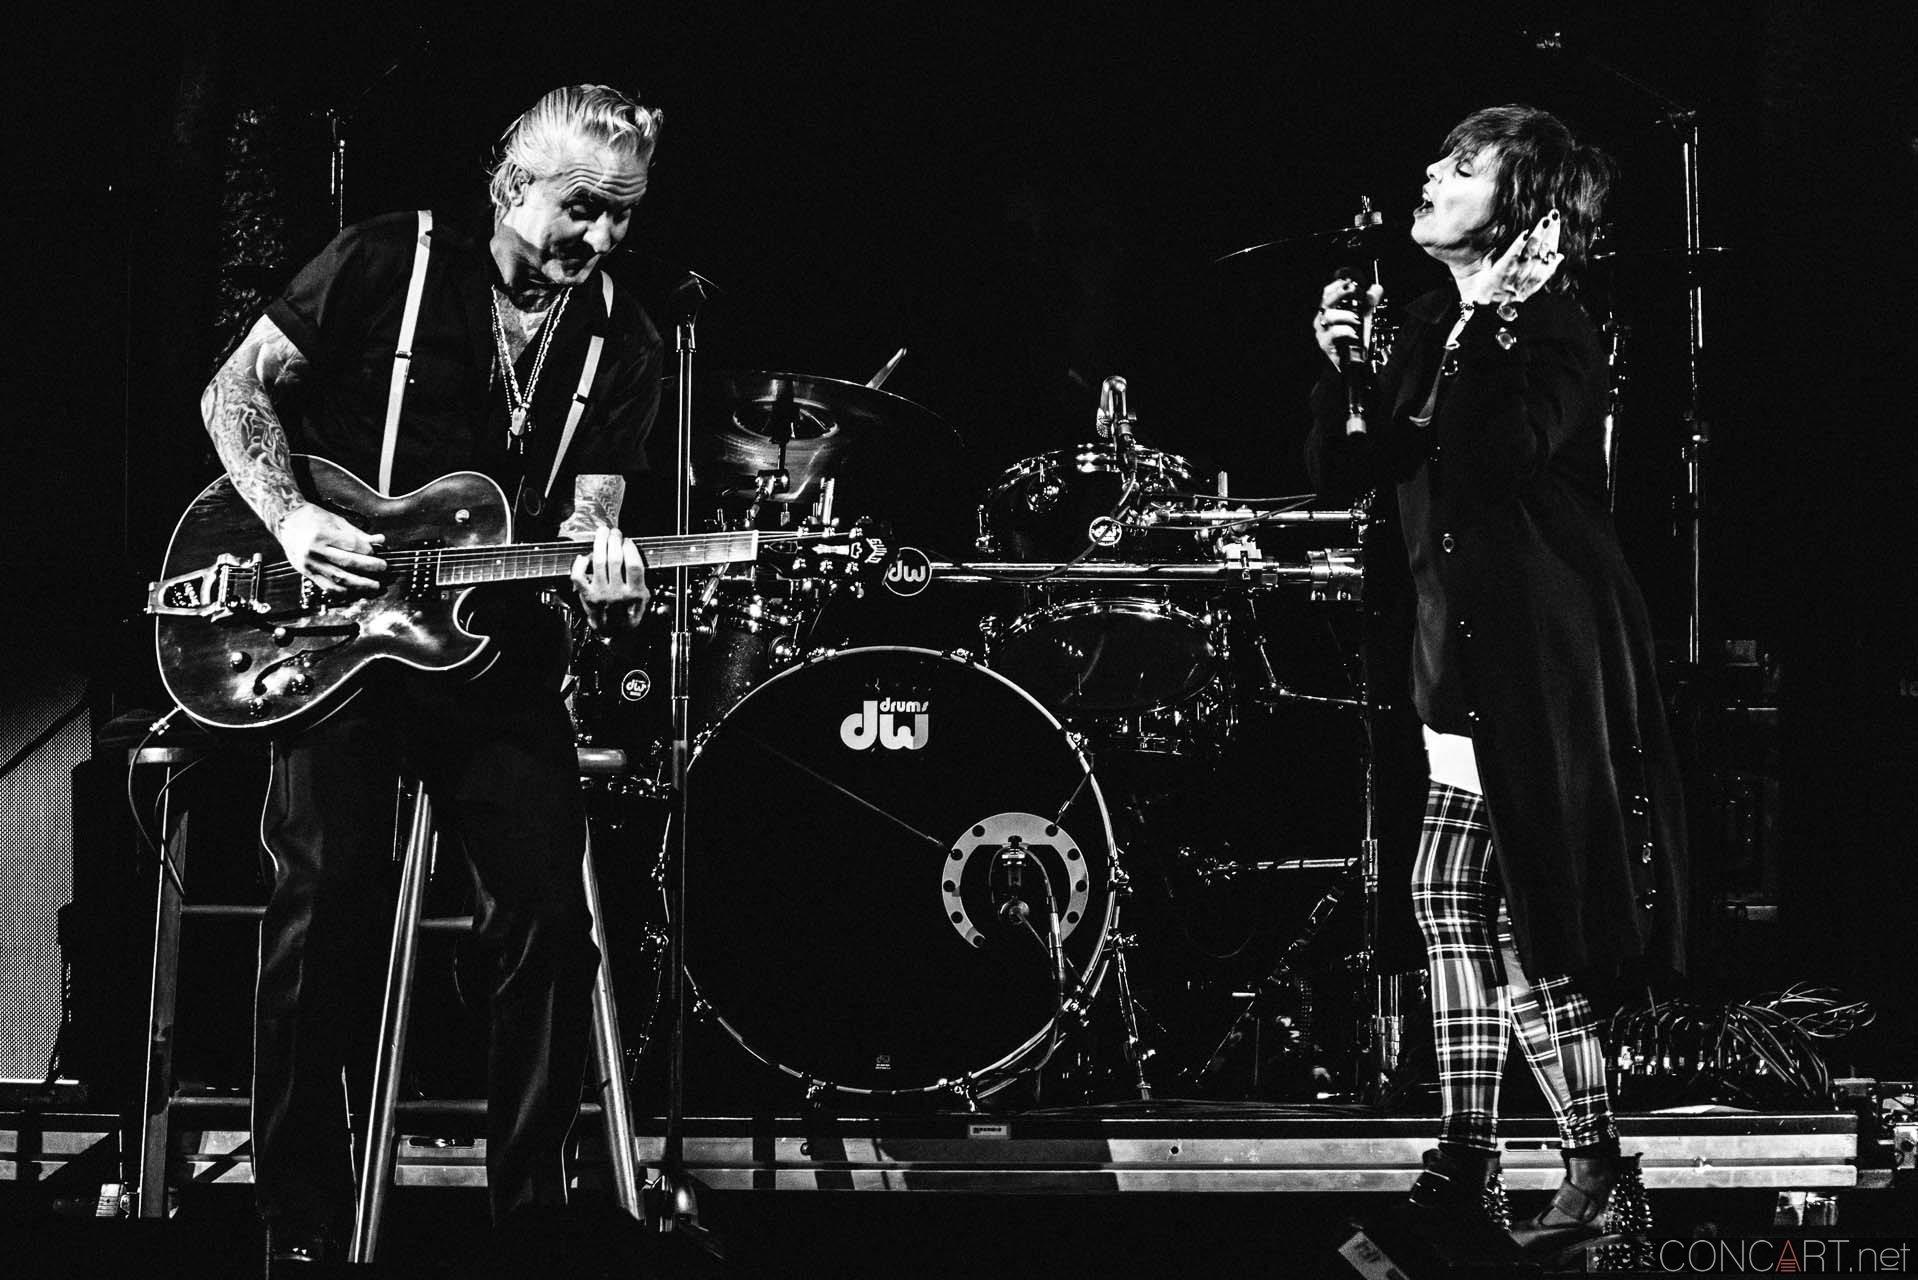 Pat Benatar & Neil Giraldo photo by Sean Molin 2